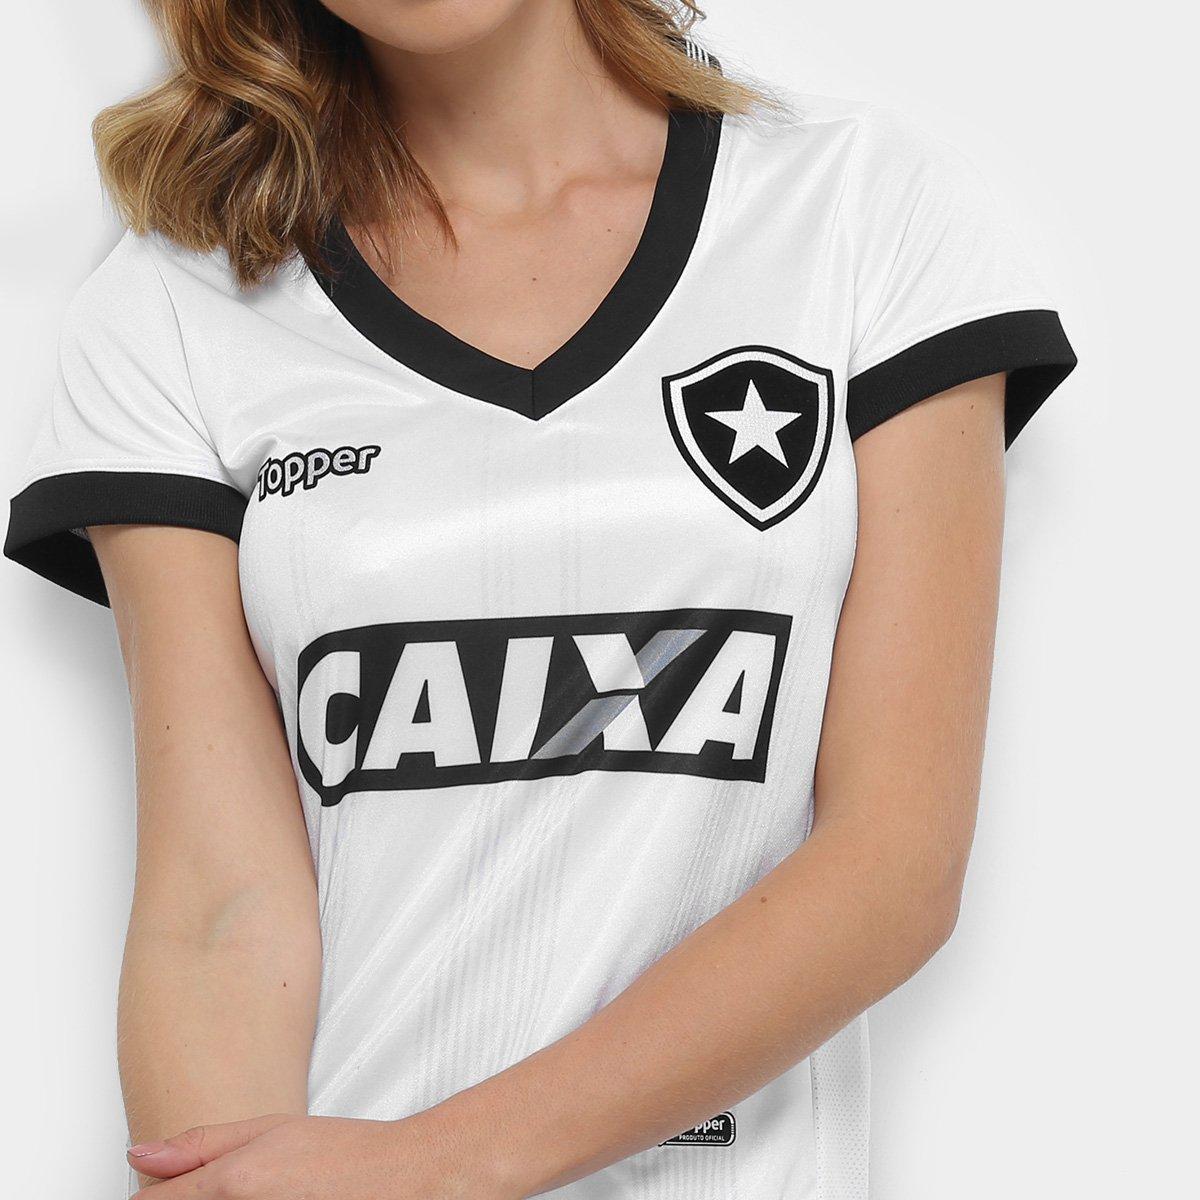 n° III Botafogo Camisa 2018 Topper s Branco Feminina Torcedor 4pwFf